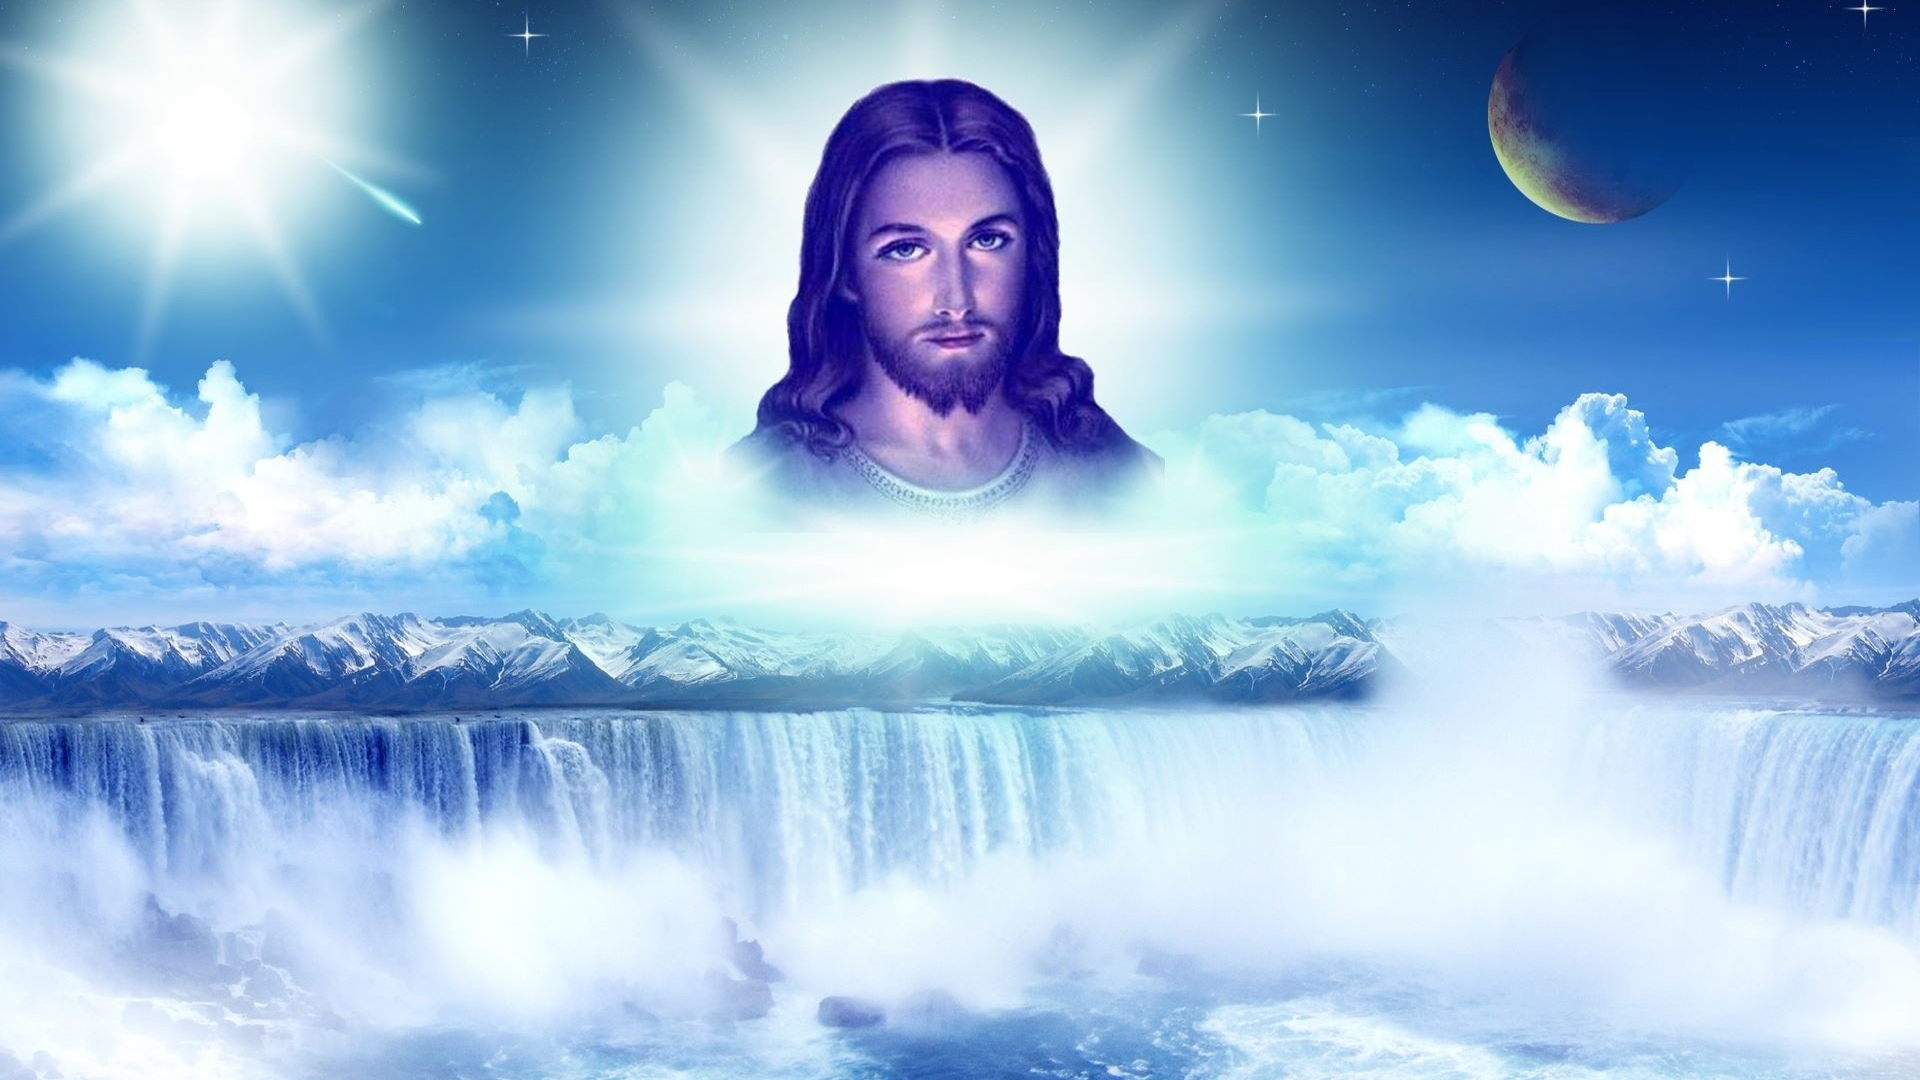 jesus religion waterfall wallpaper background 1920x1080